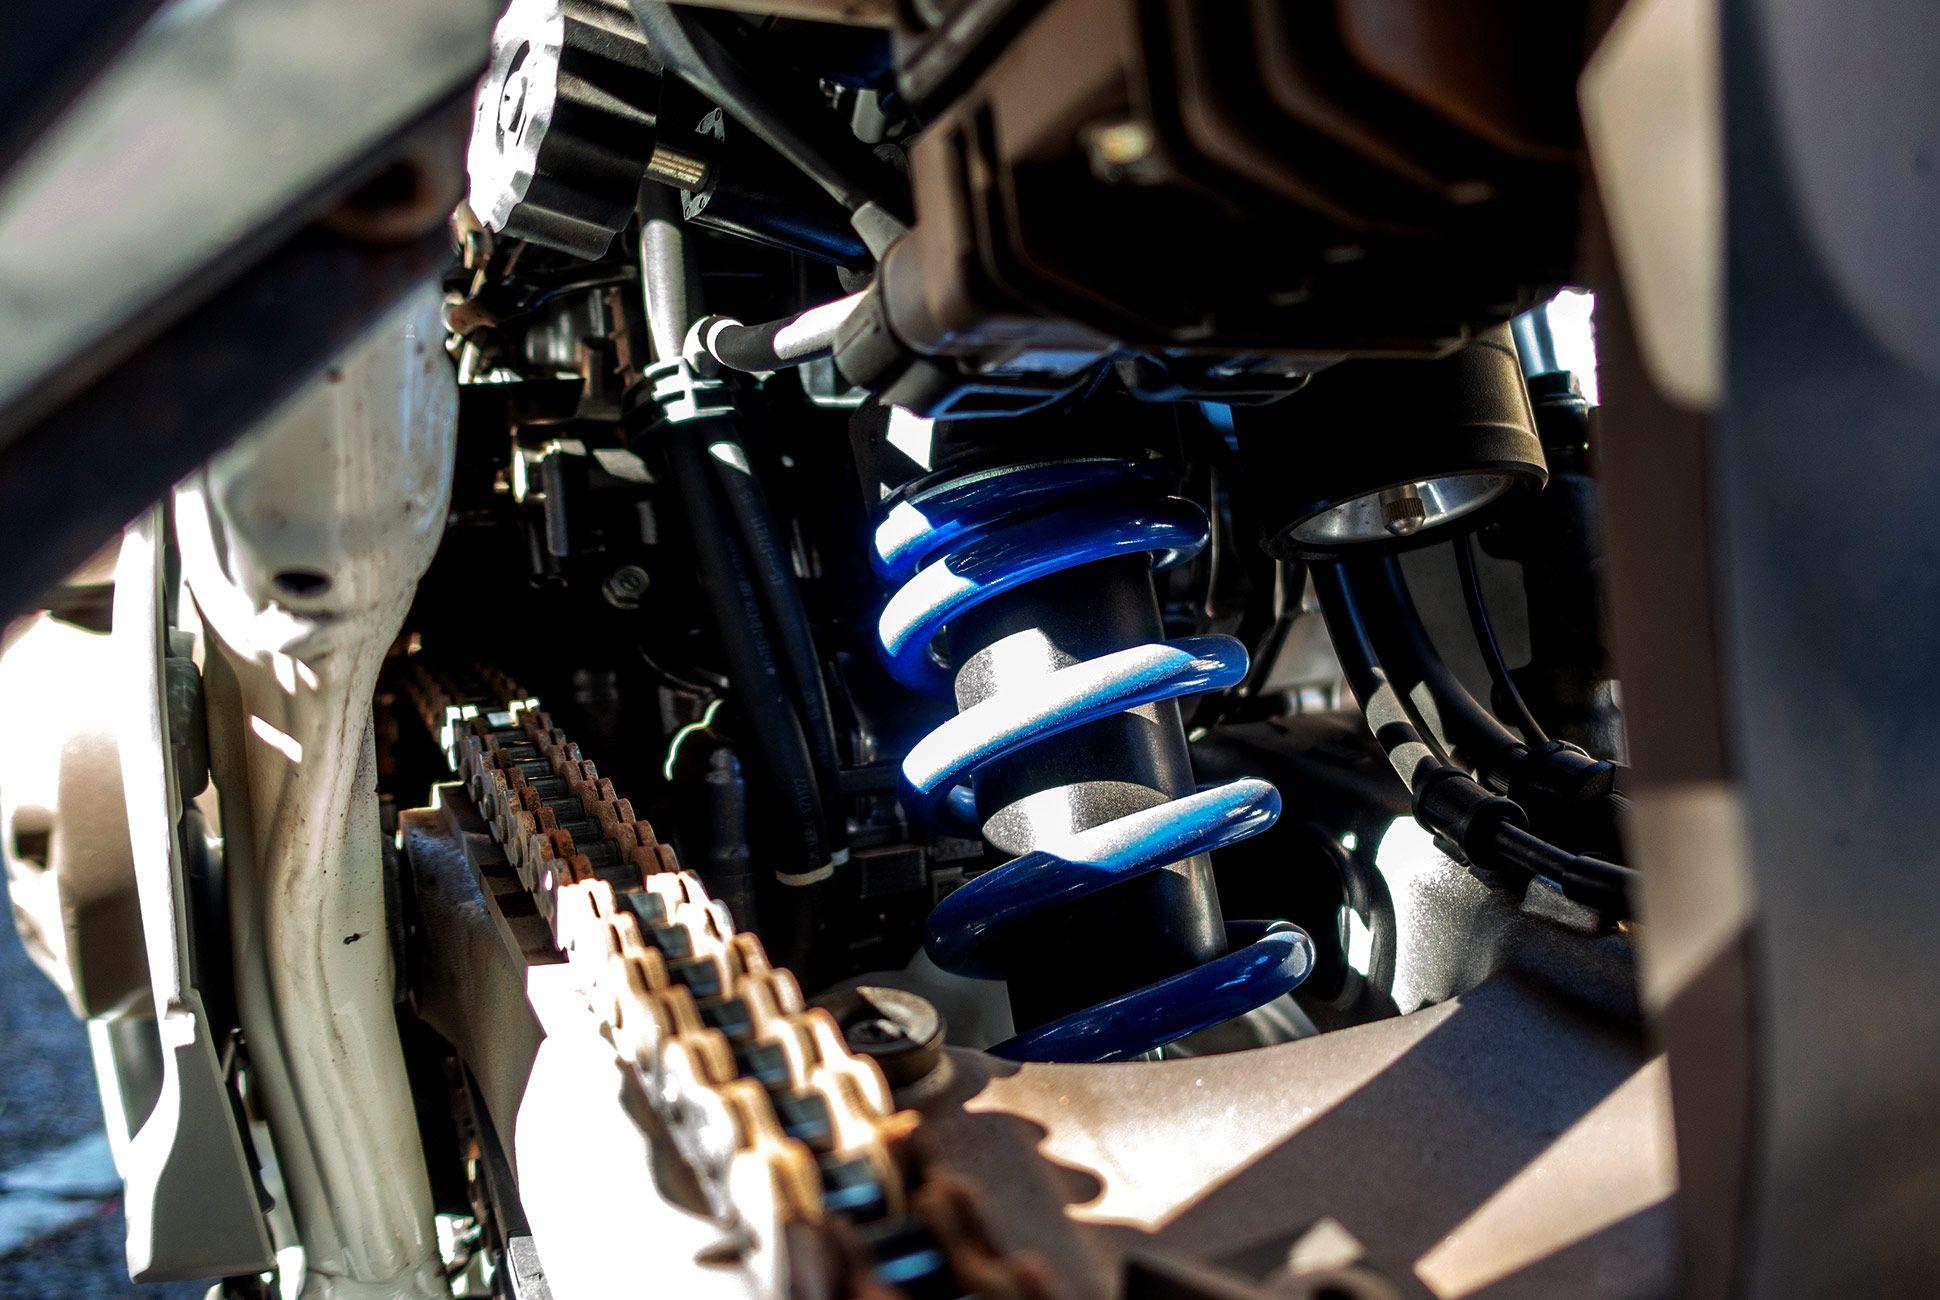 2018-Honda-Africa-Twin-Review-gear-patrol-slide-6